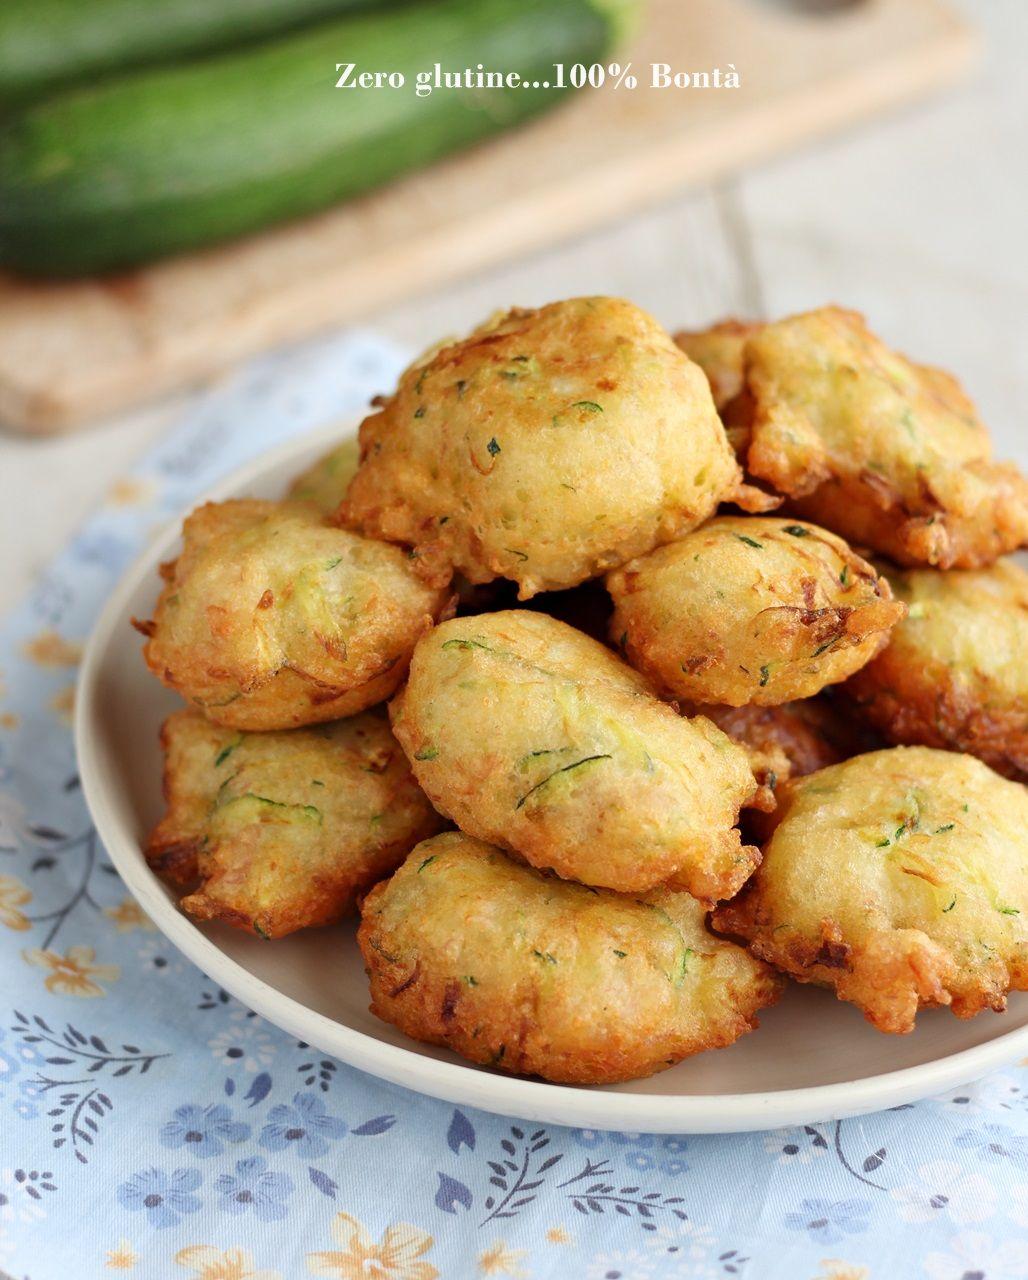 d0a85ae2490ac4ceaf655f5f220dff76 - Ricette Vegetariane Veloci